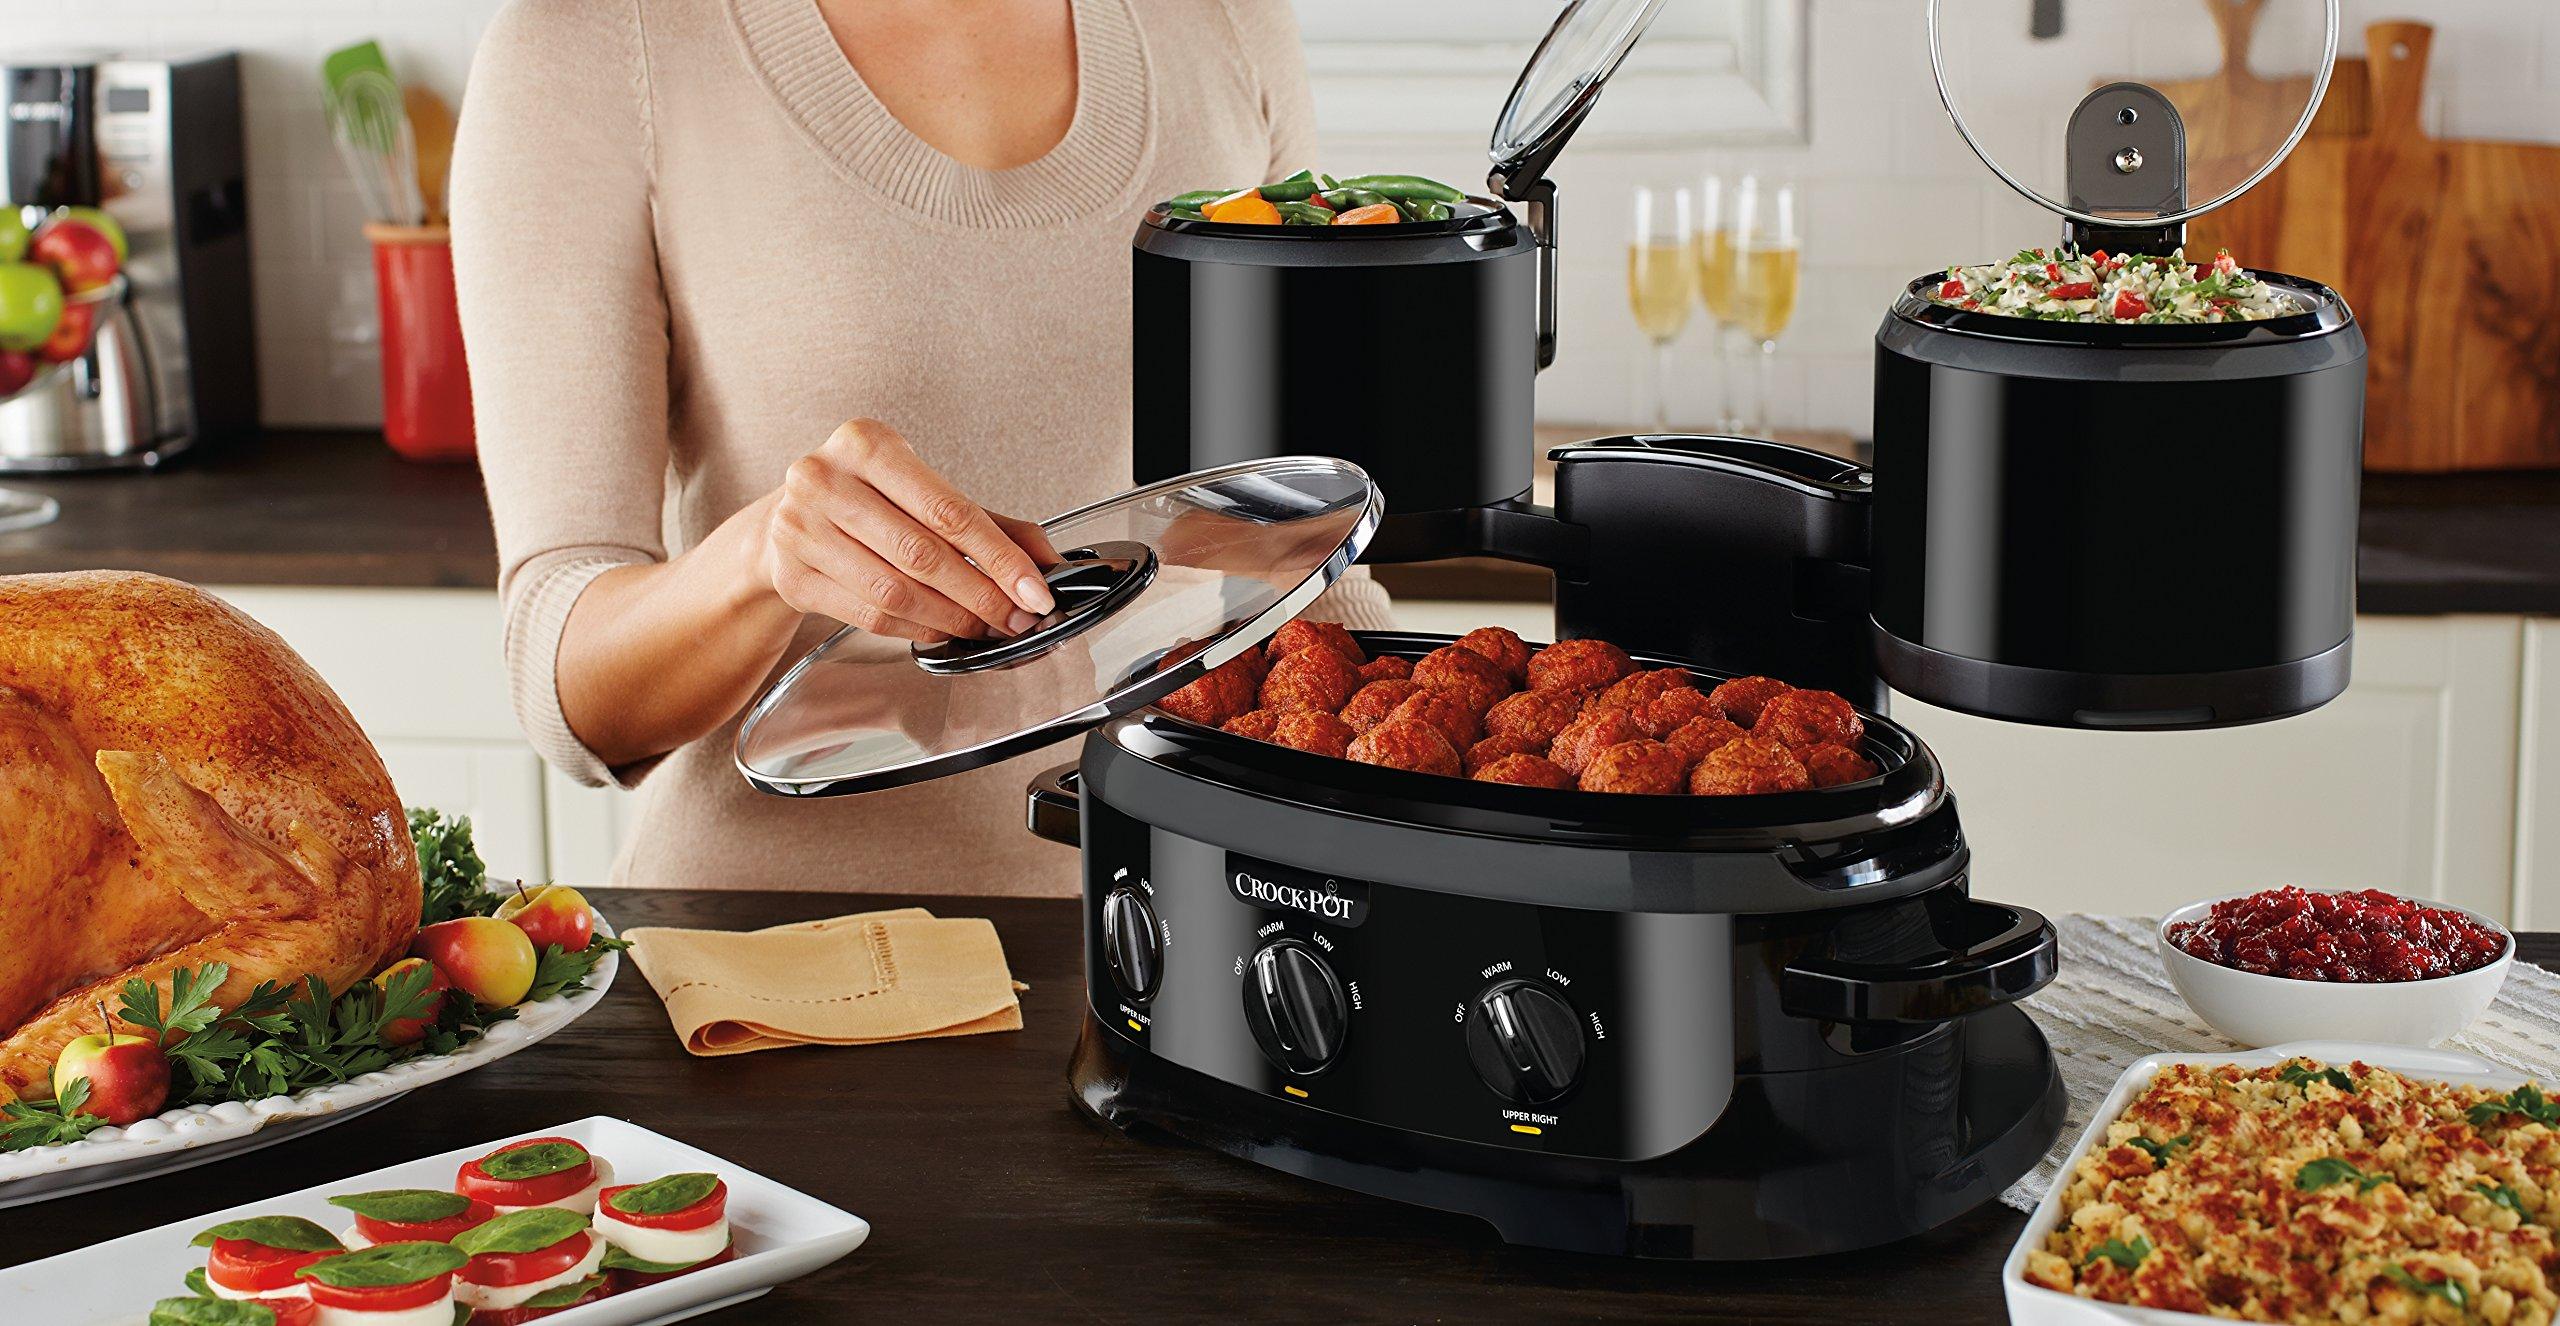 Crock-pot SCCPTOWER-B Swing and Serve Slow Cooker, Black by Crock-Pot (Image #3)